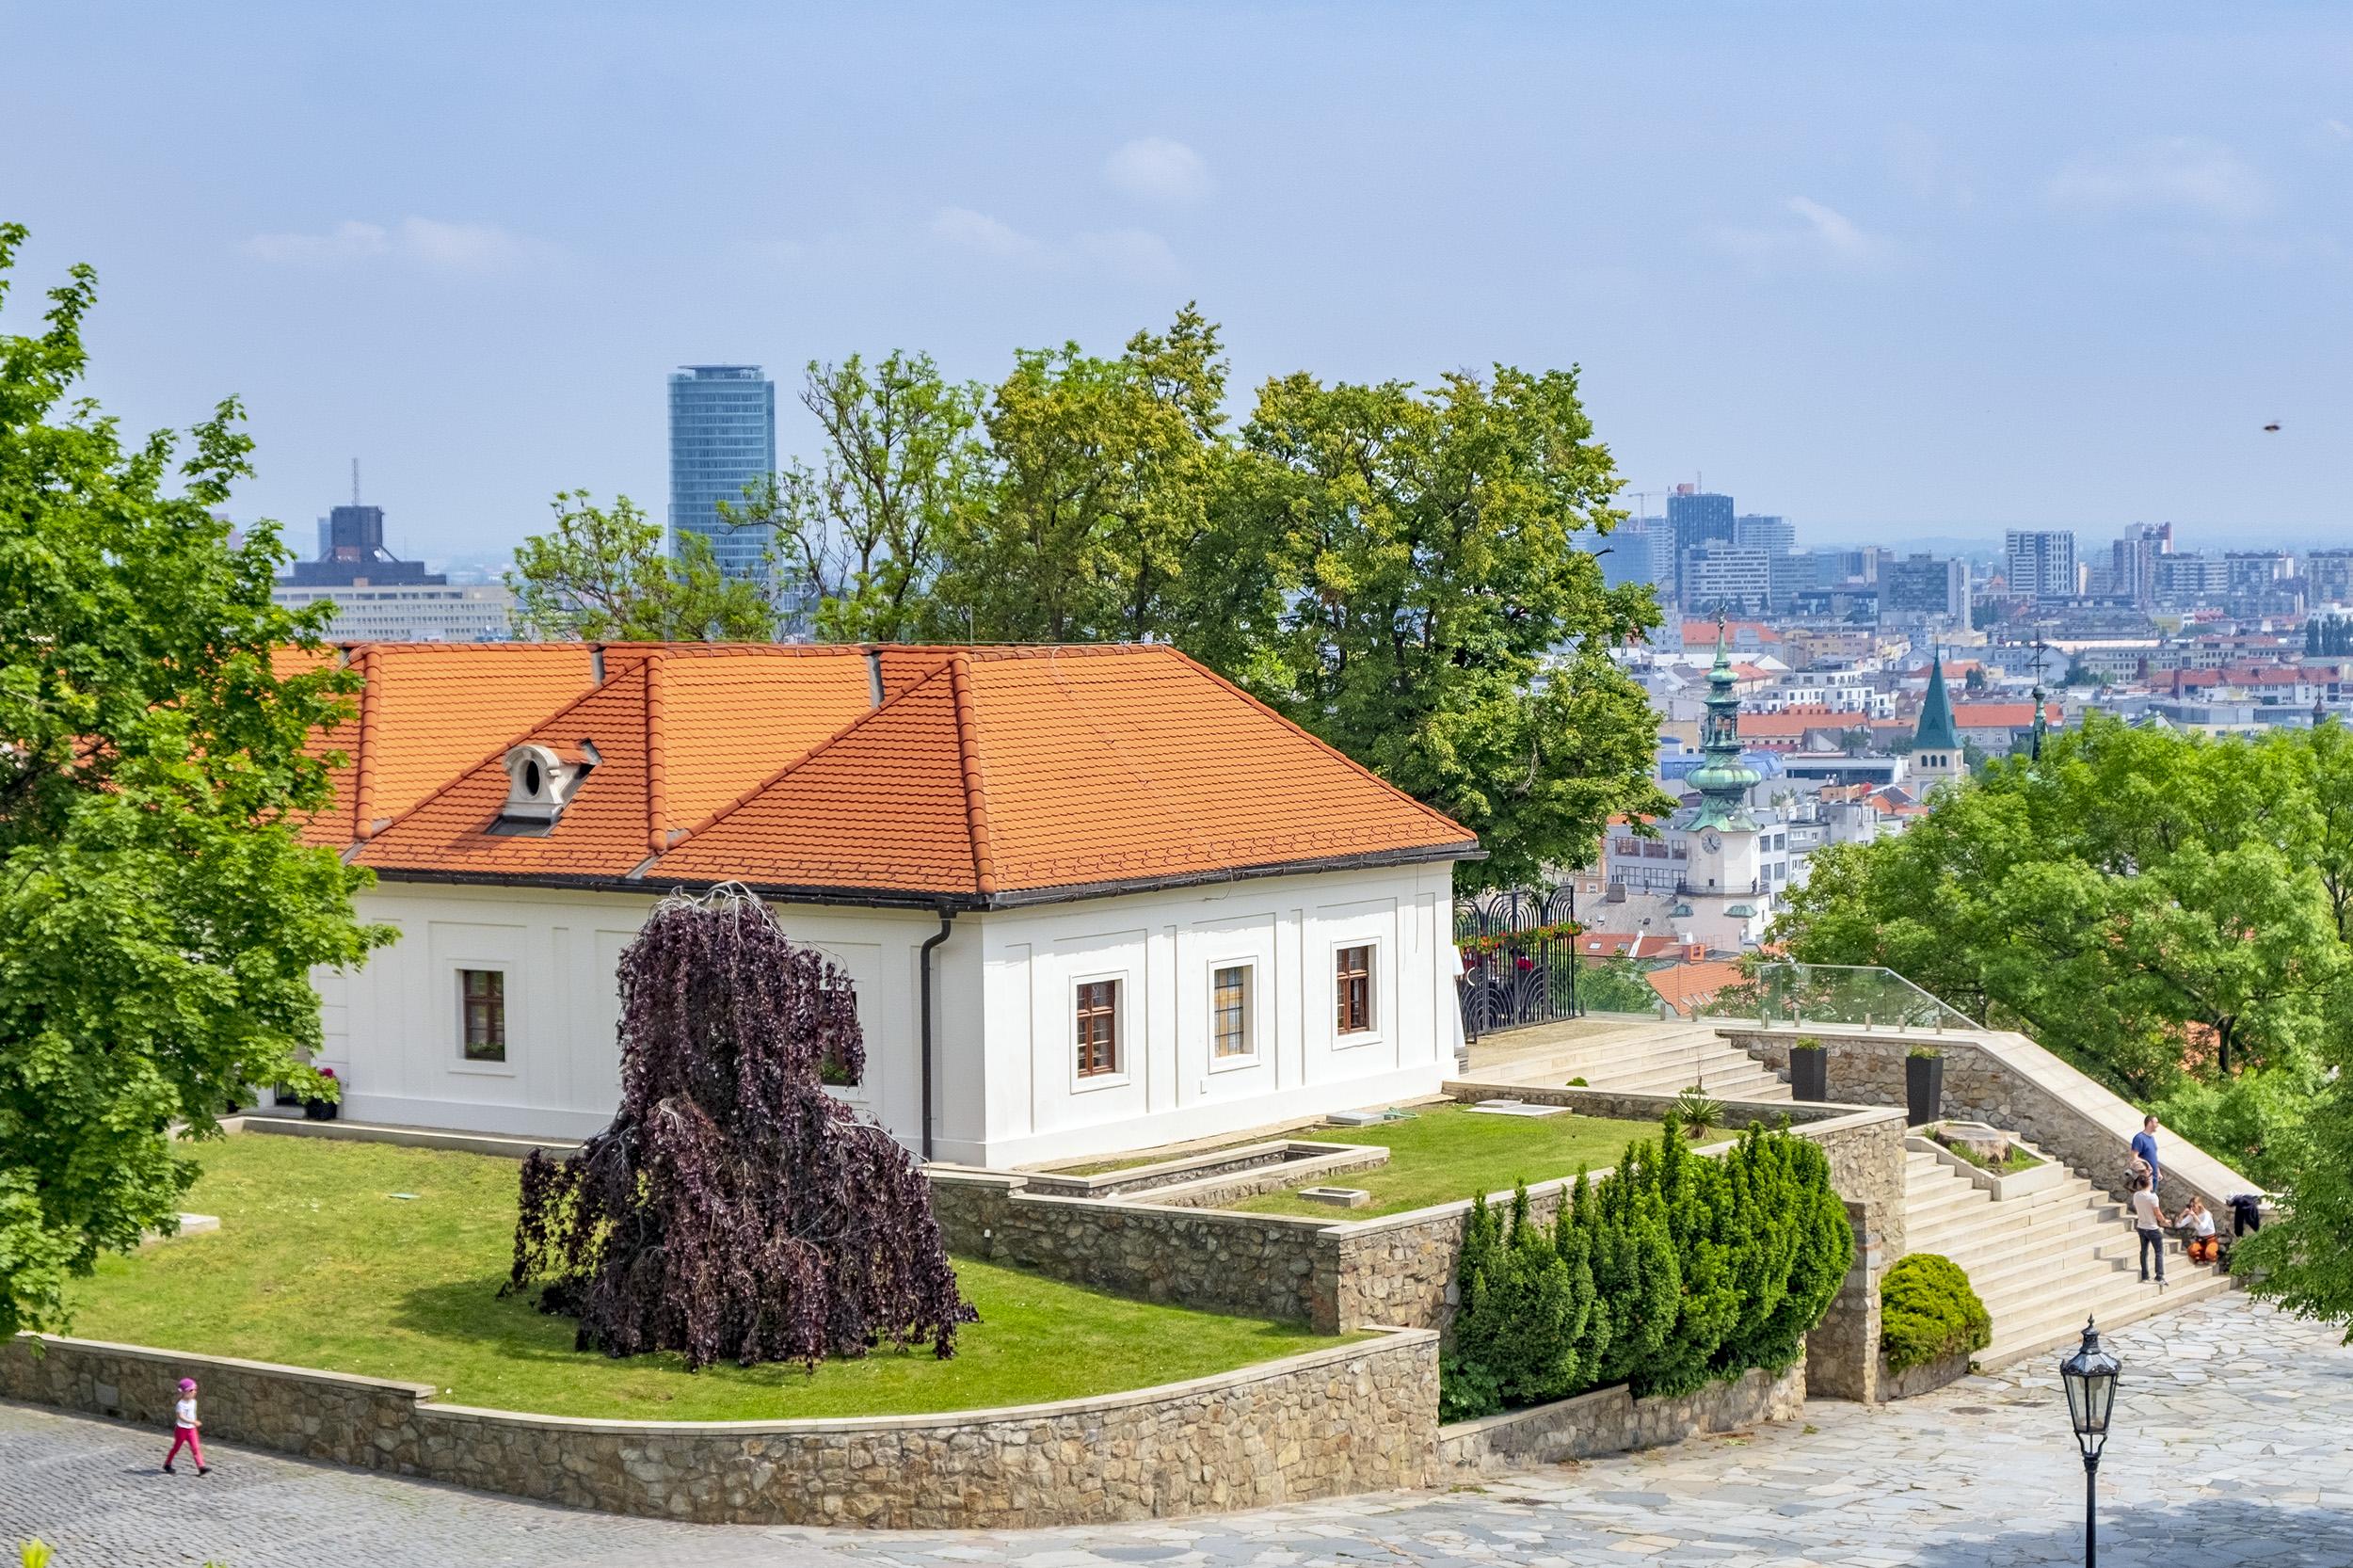 Reštaurácia Hrad Slottet i Bratislava